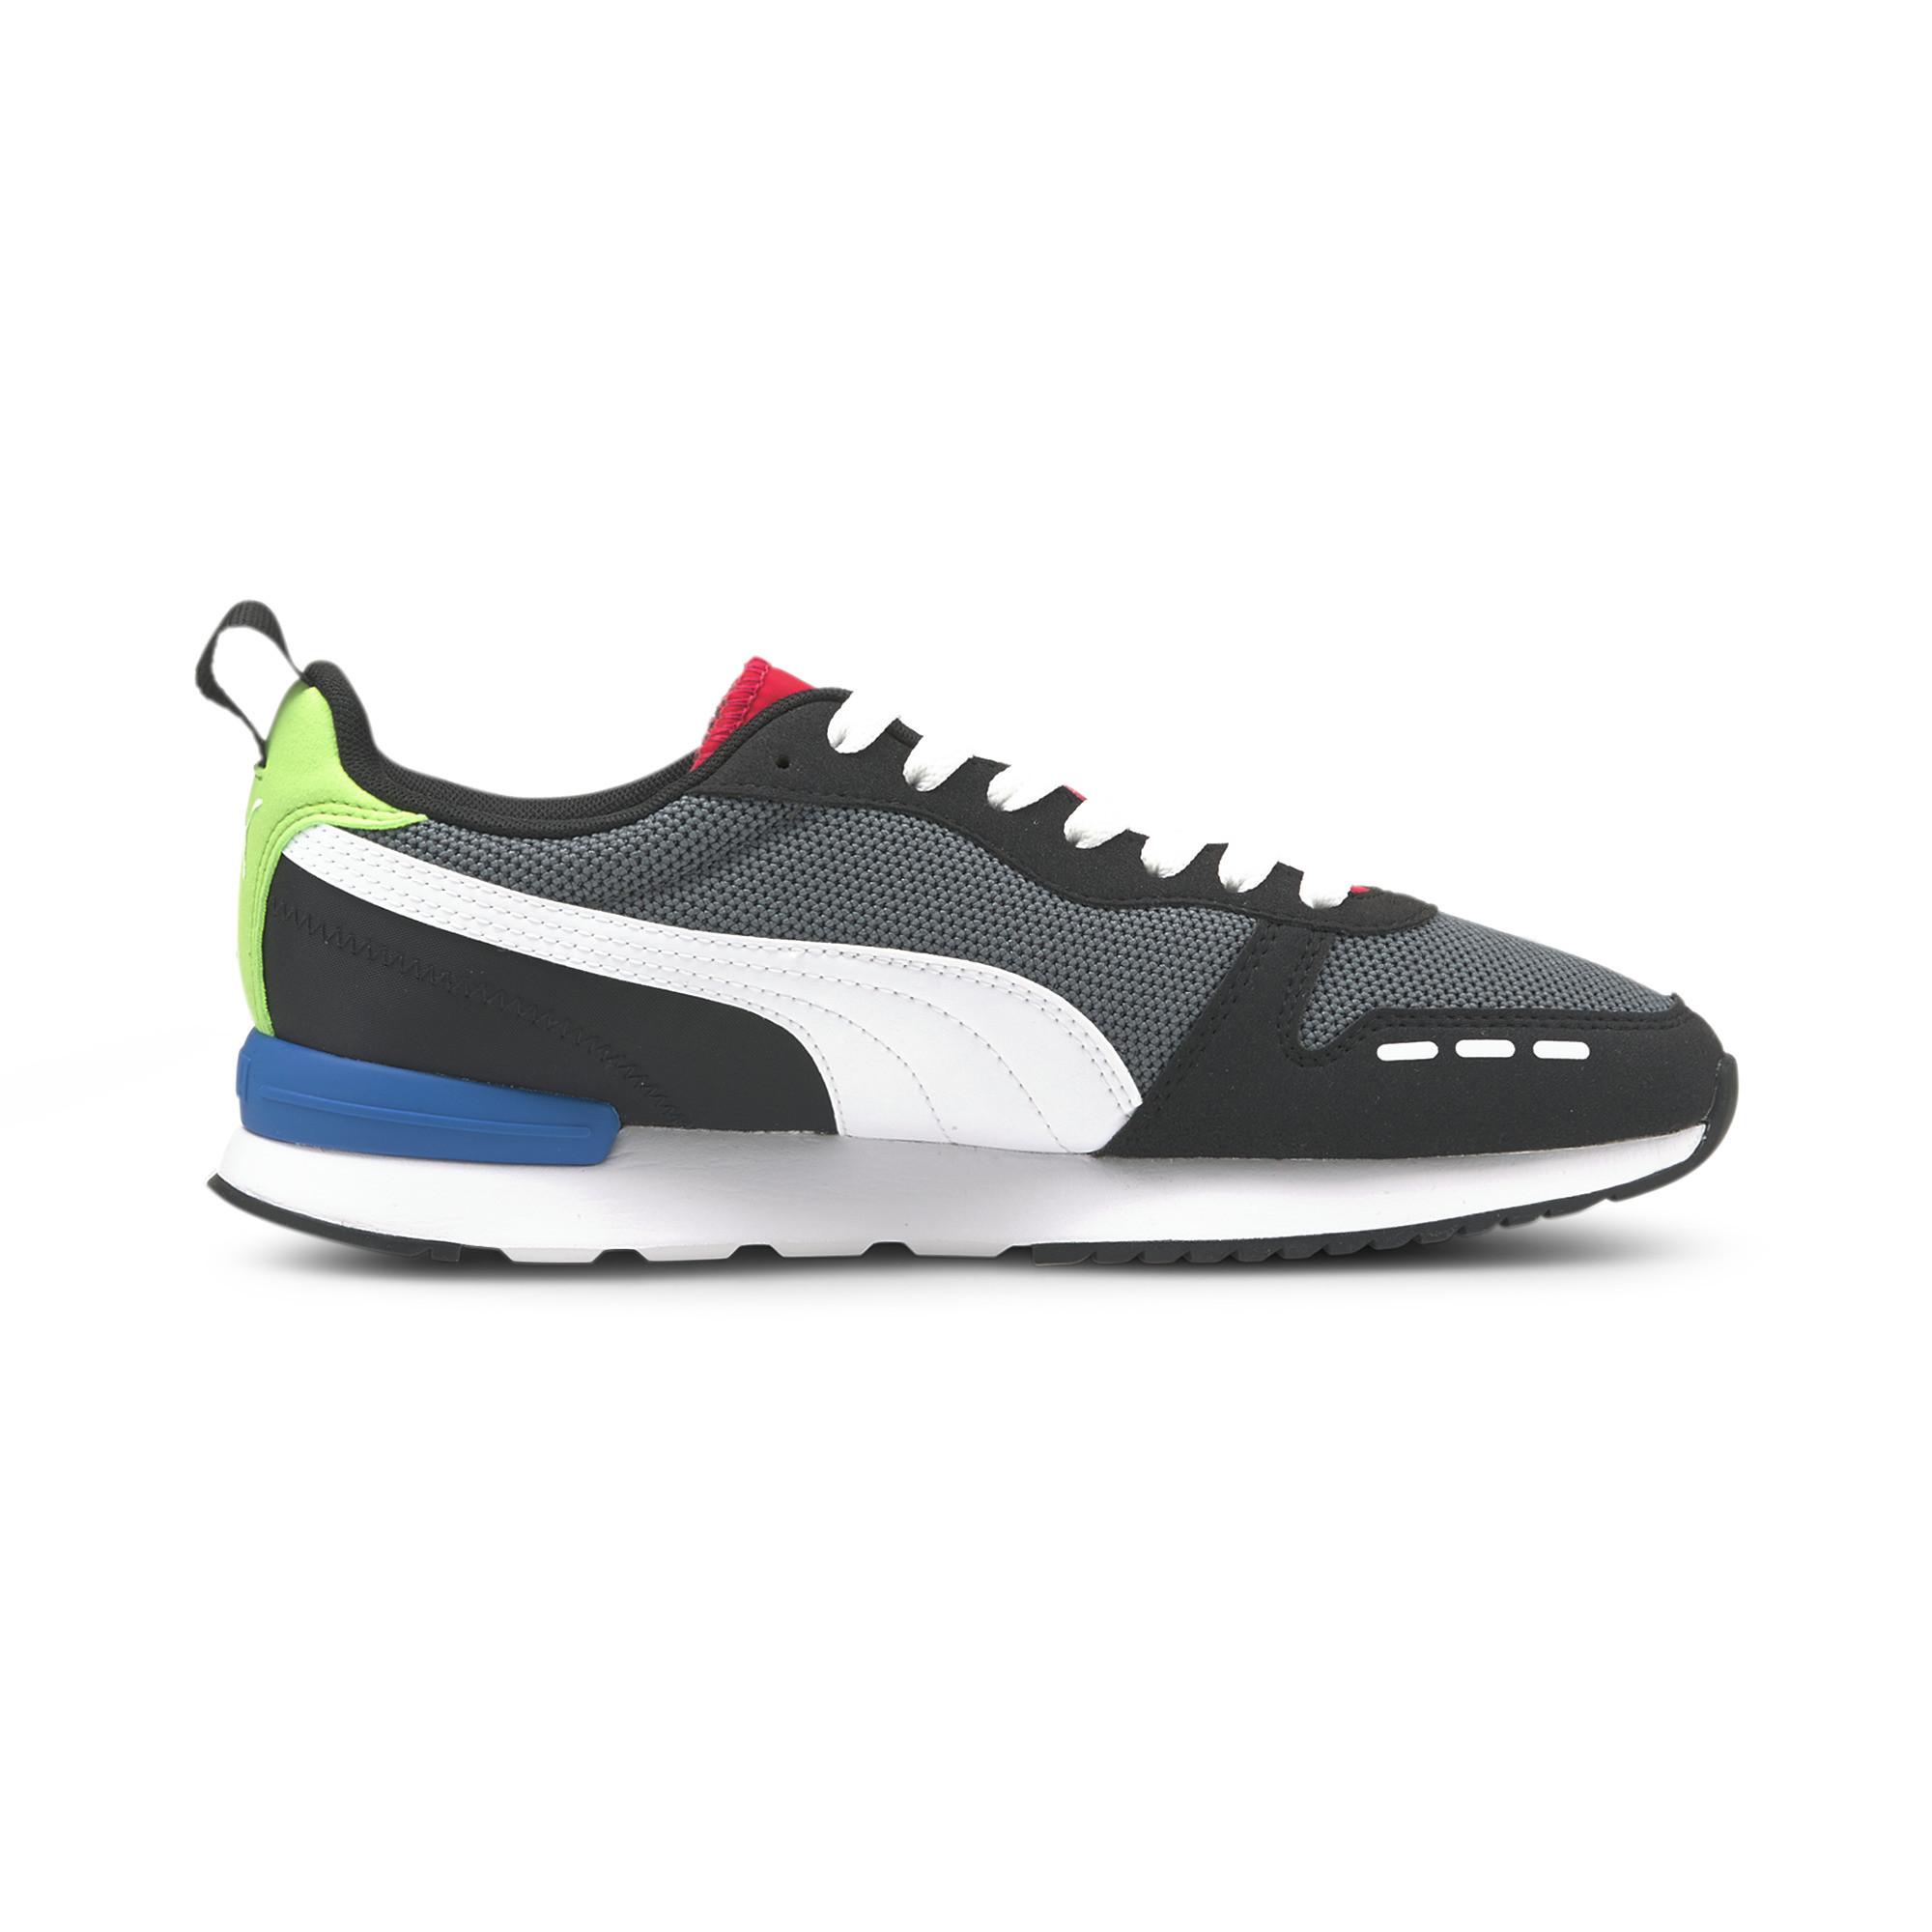 thumbnail 11 - PUMA Men's R78 Sneakers